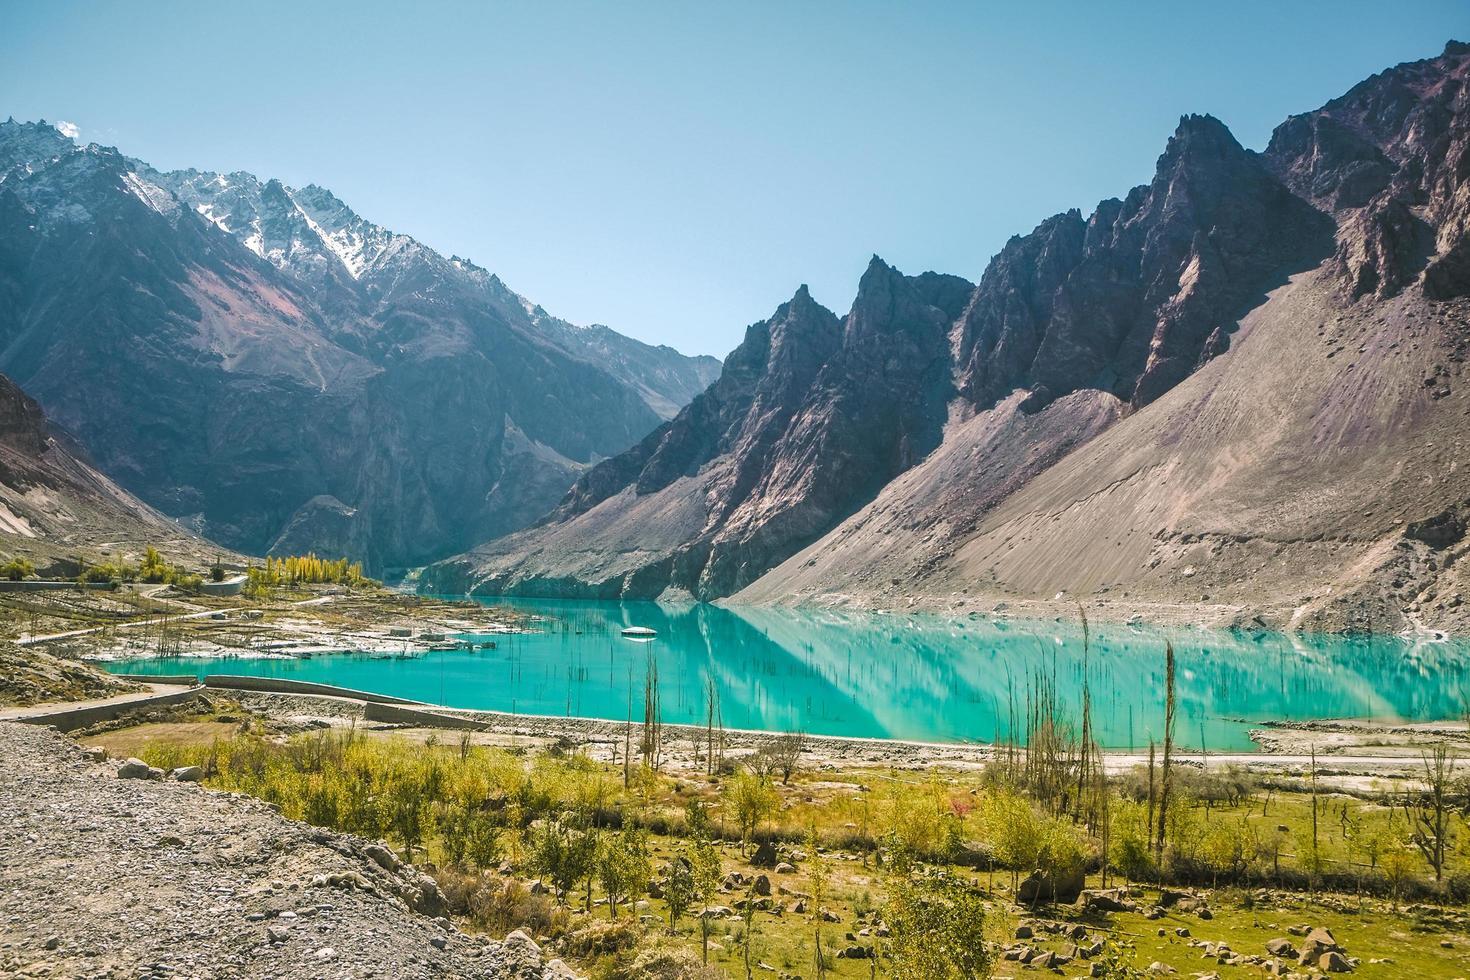 Attabad lake in Karakoram Mountain Range, Hunza valley, Pakistan. photo